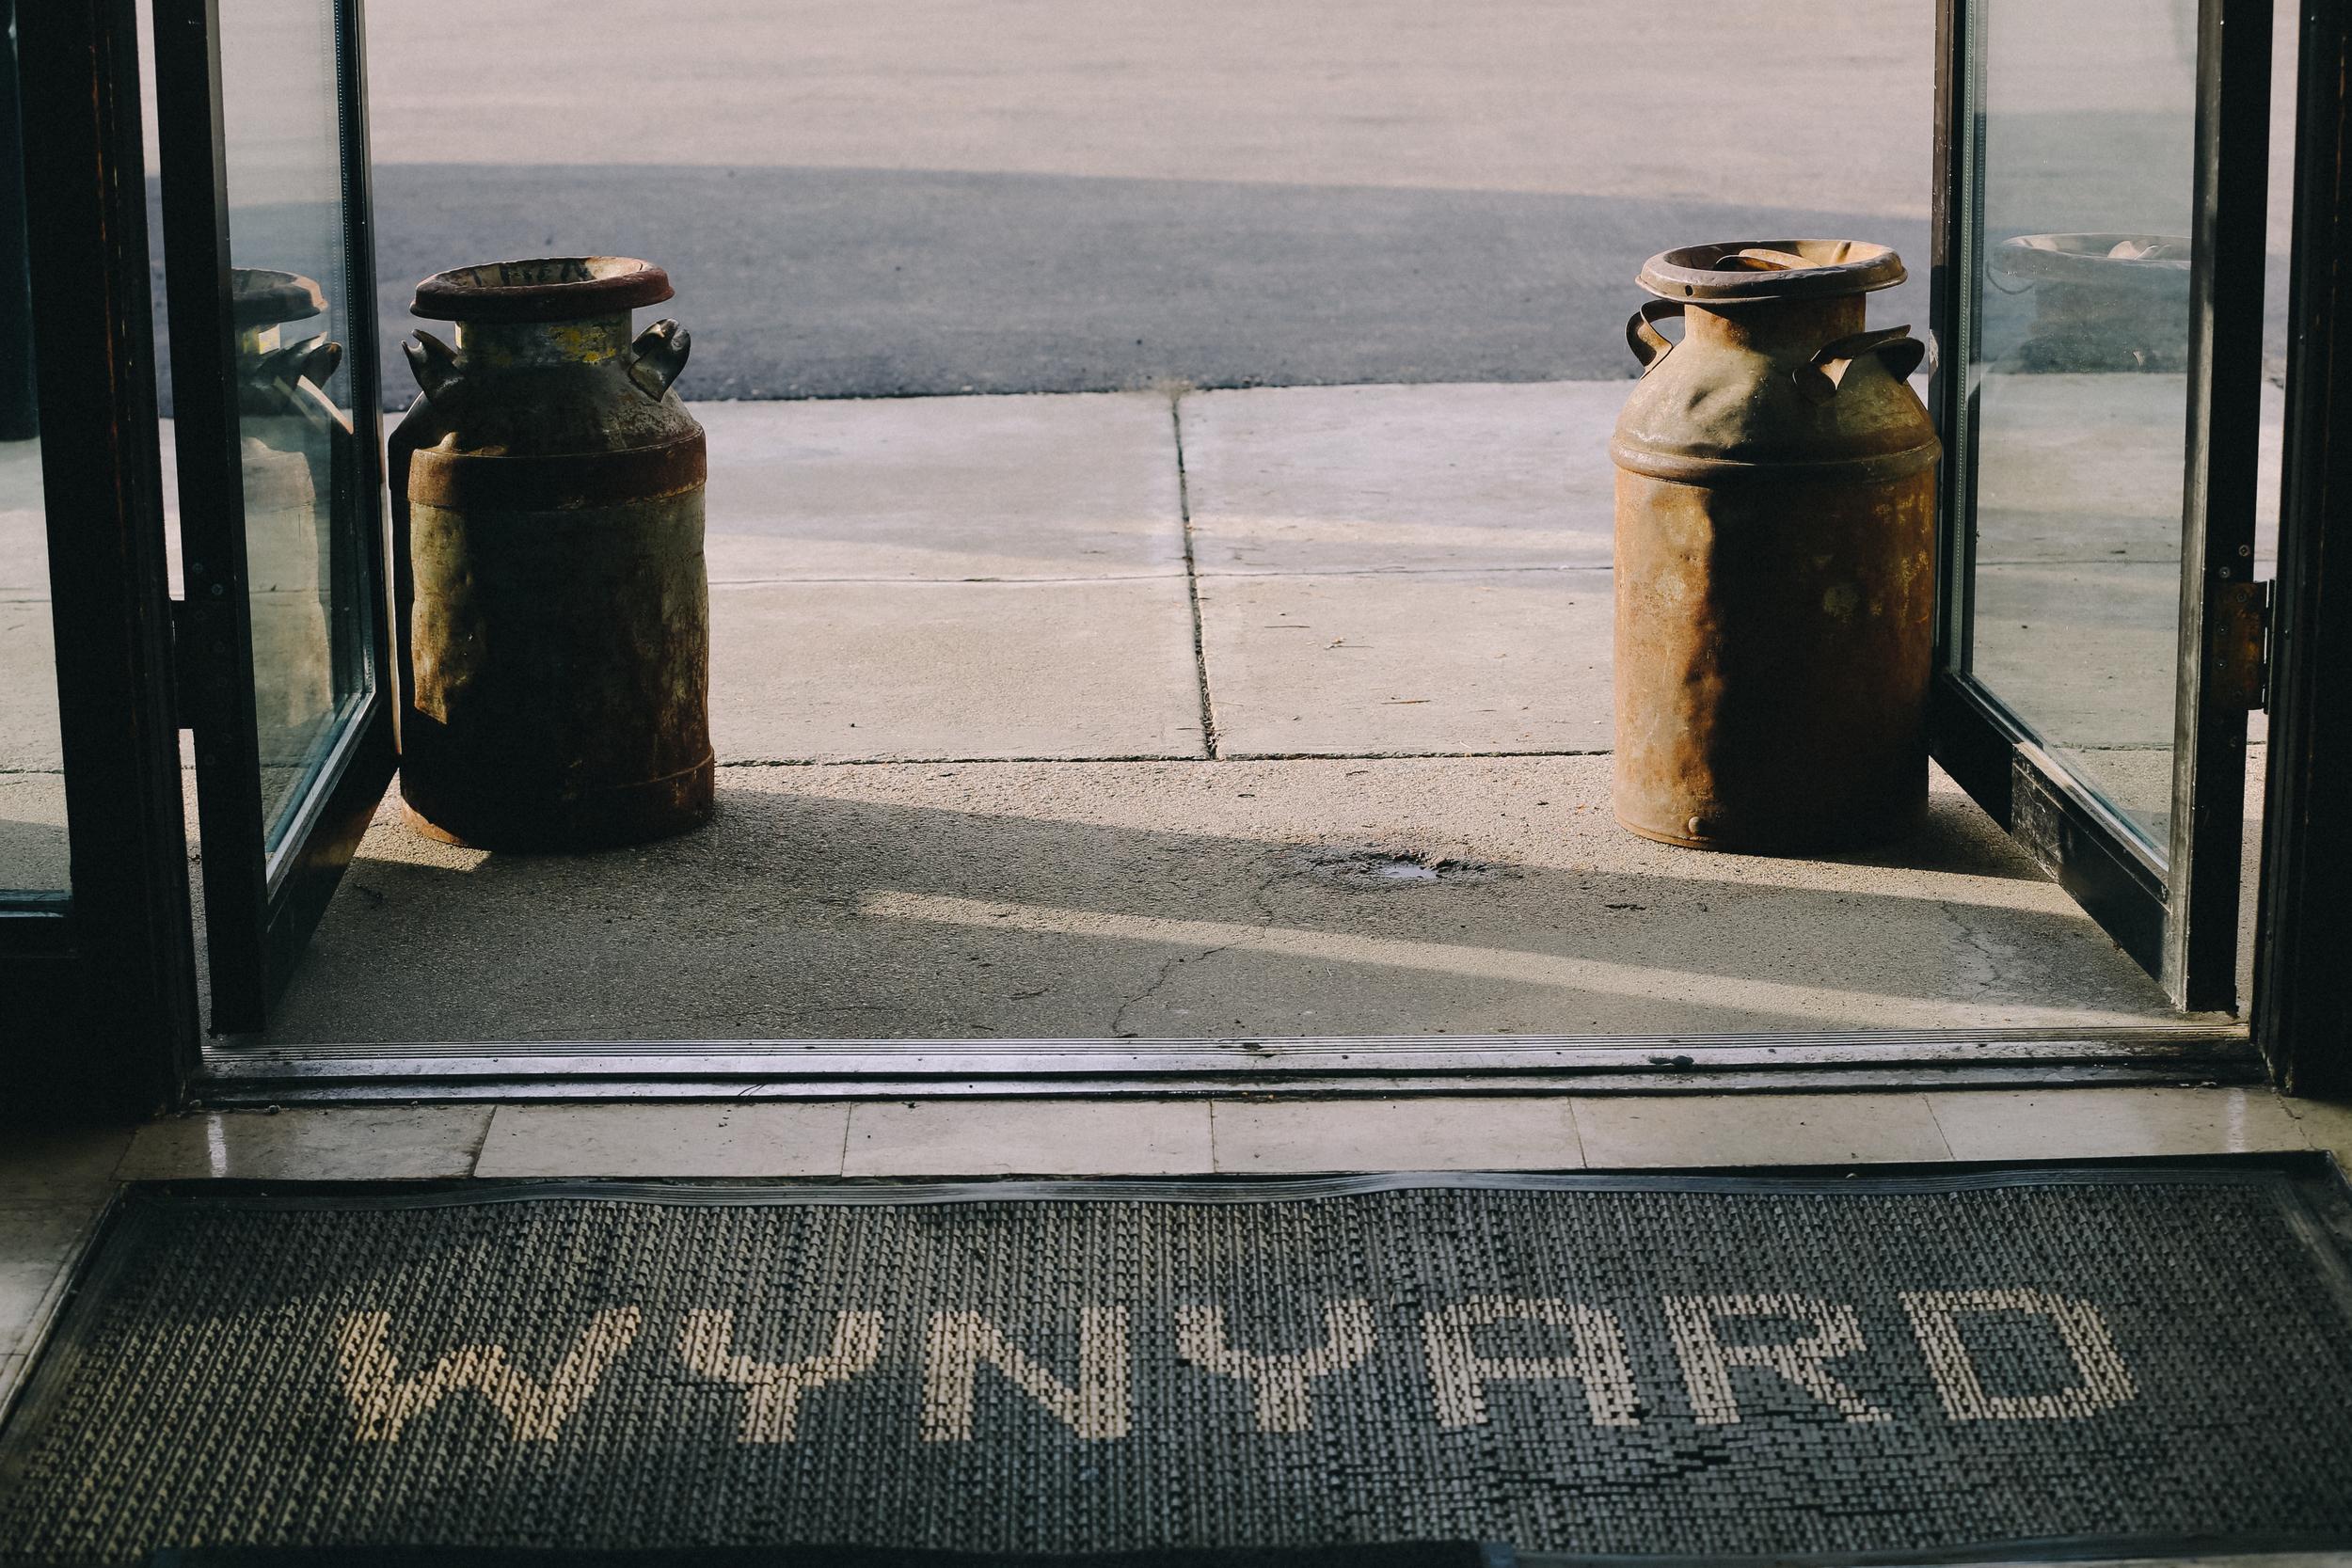 sharai siemens photo-107.jpg